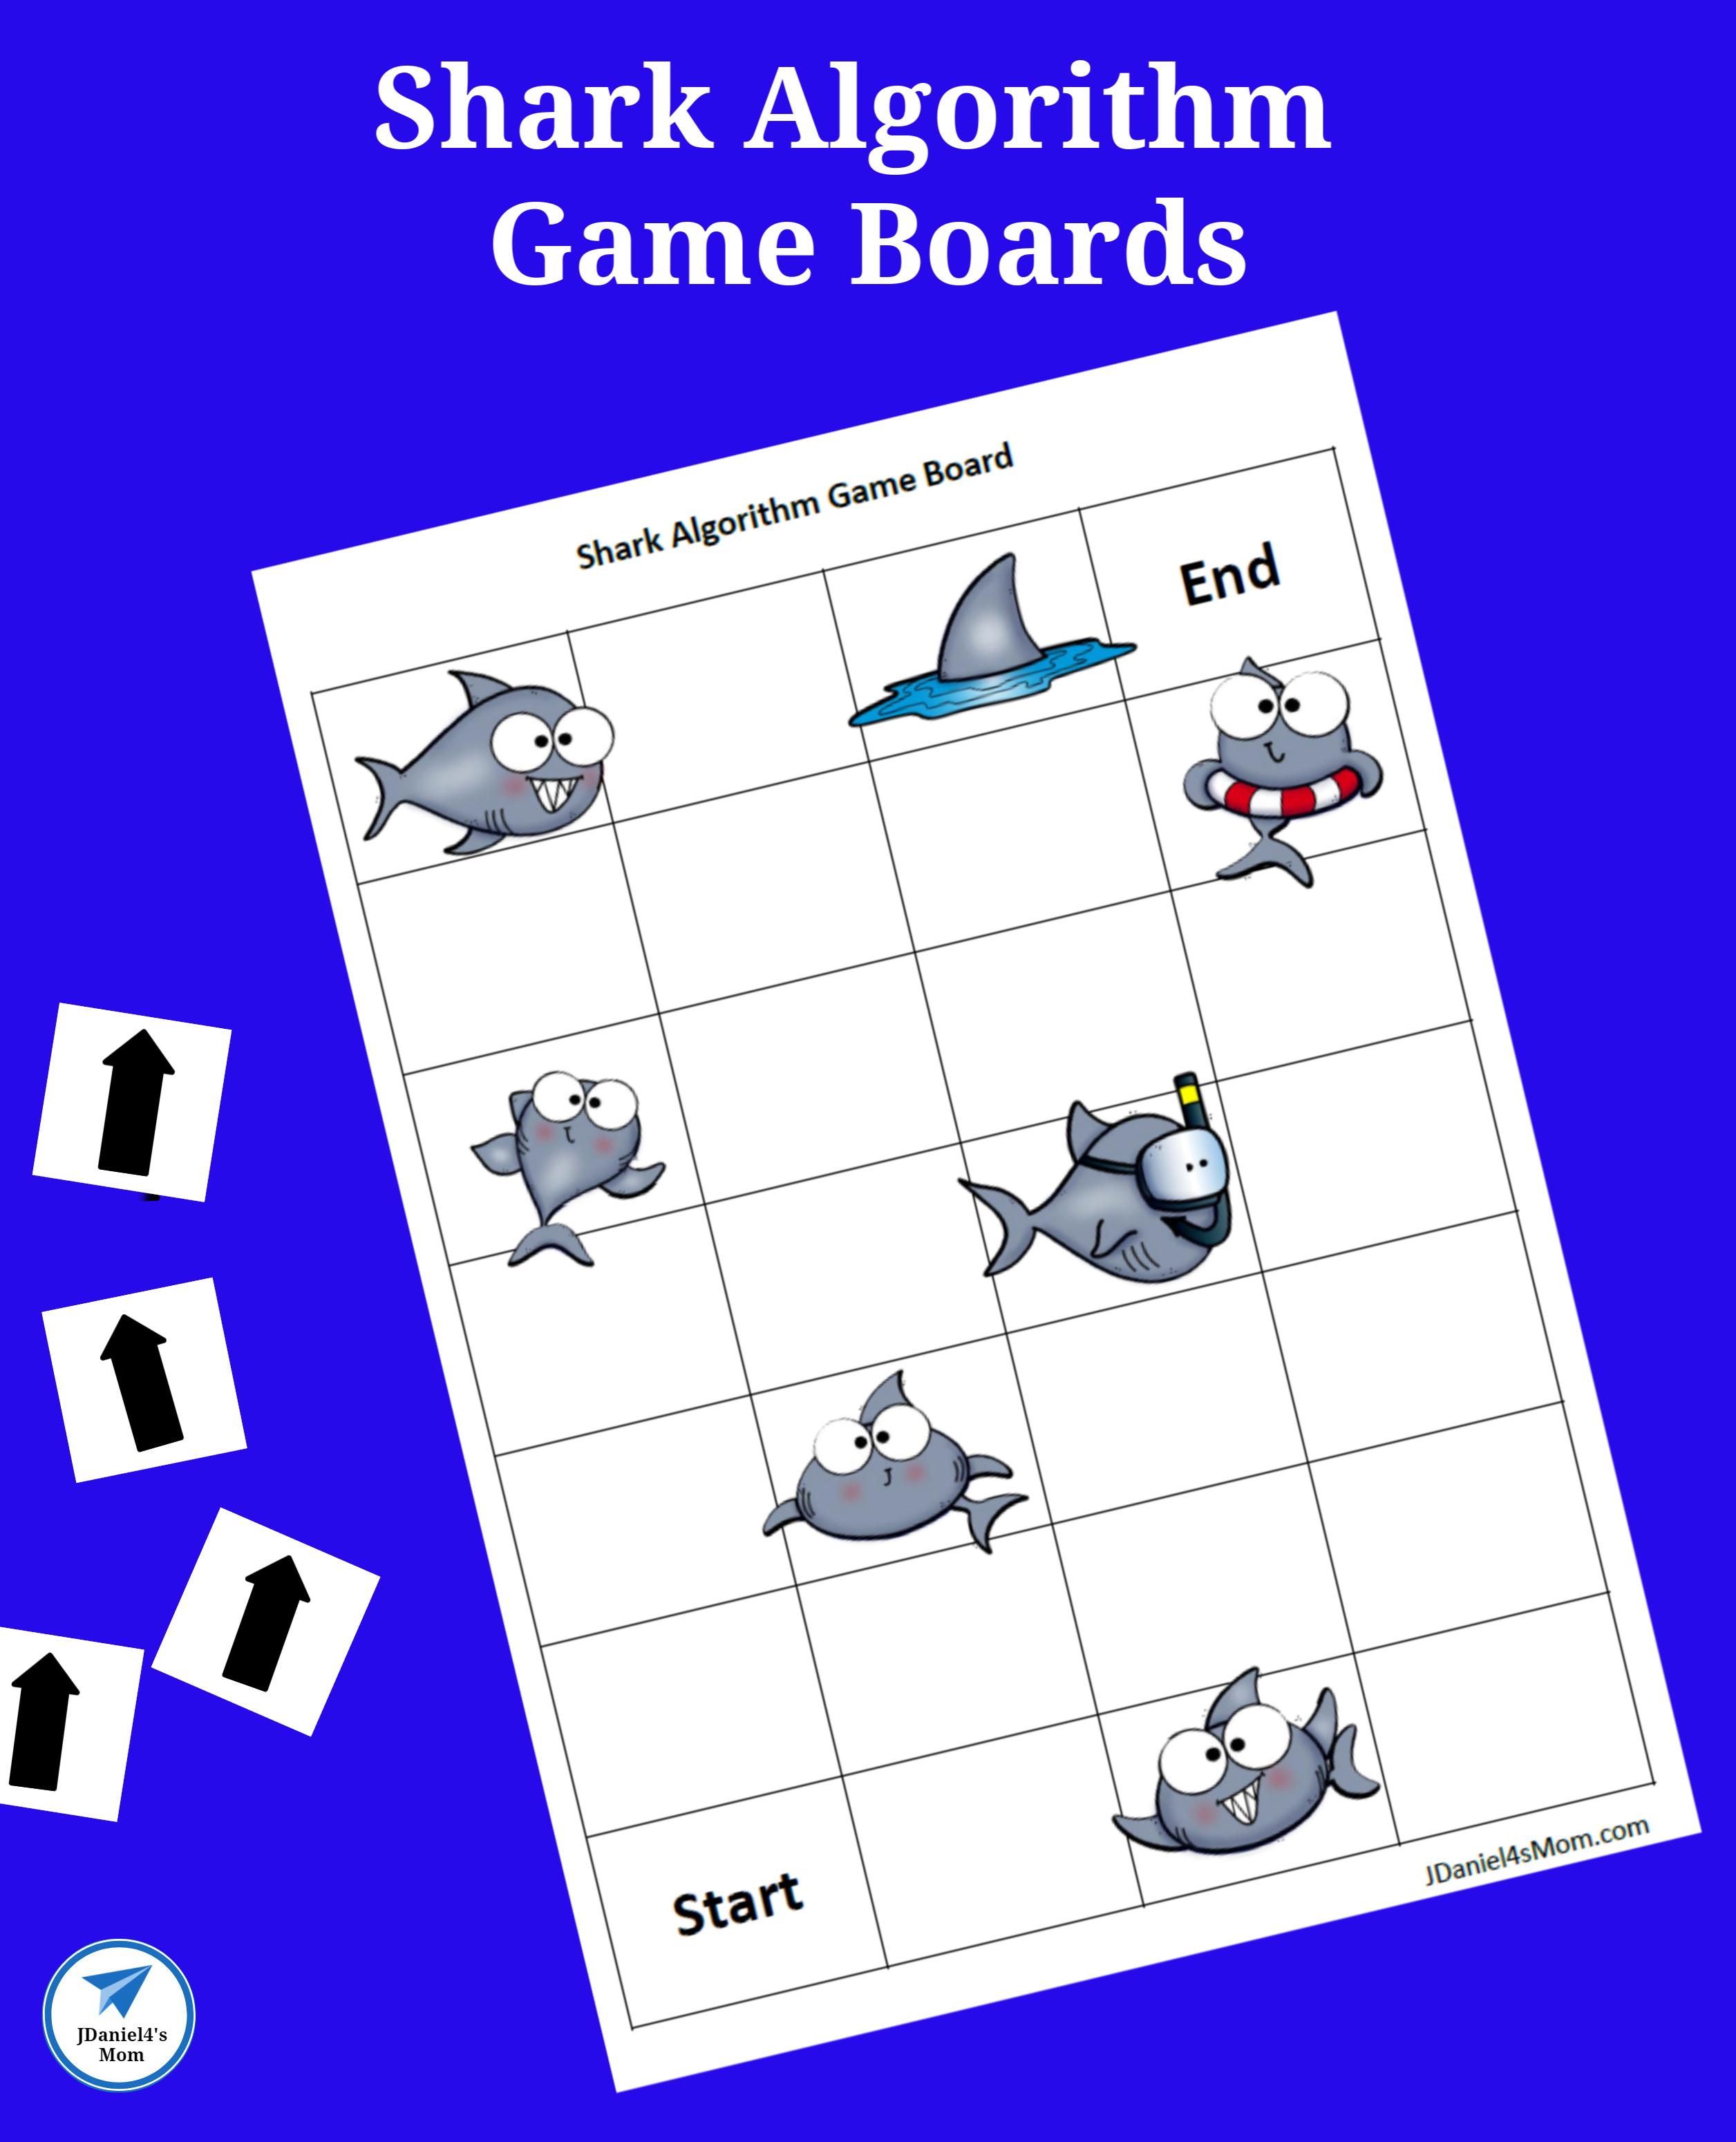 Offline Coding Academy Printable Shark Algorithm Game Boards Jdaniel4s Mom Coding Academy Coding For Kids Craft Activities For Kids [ 3100 x 2512 Pixel ]